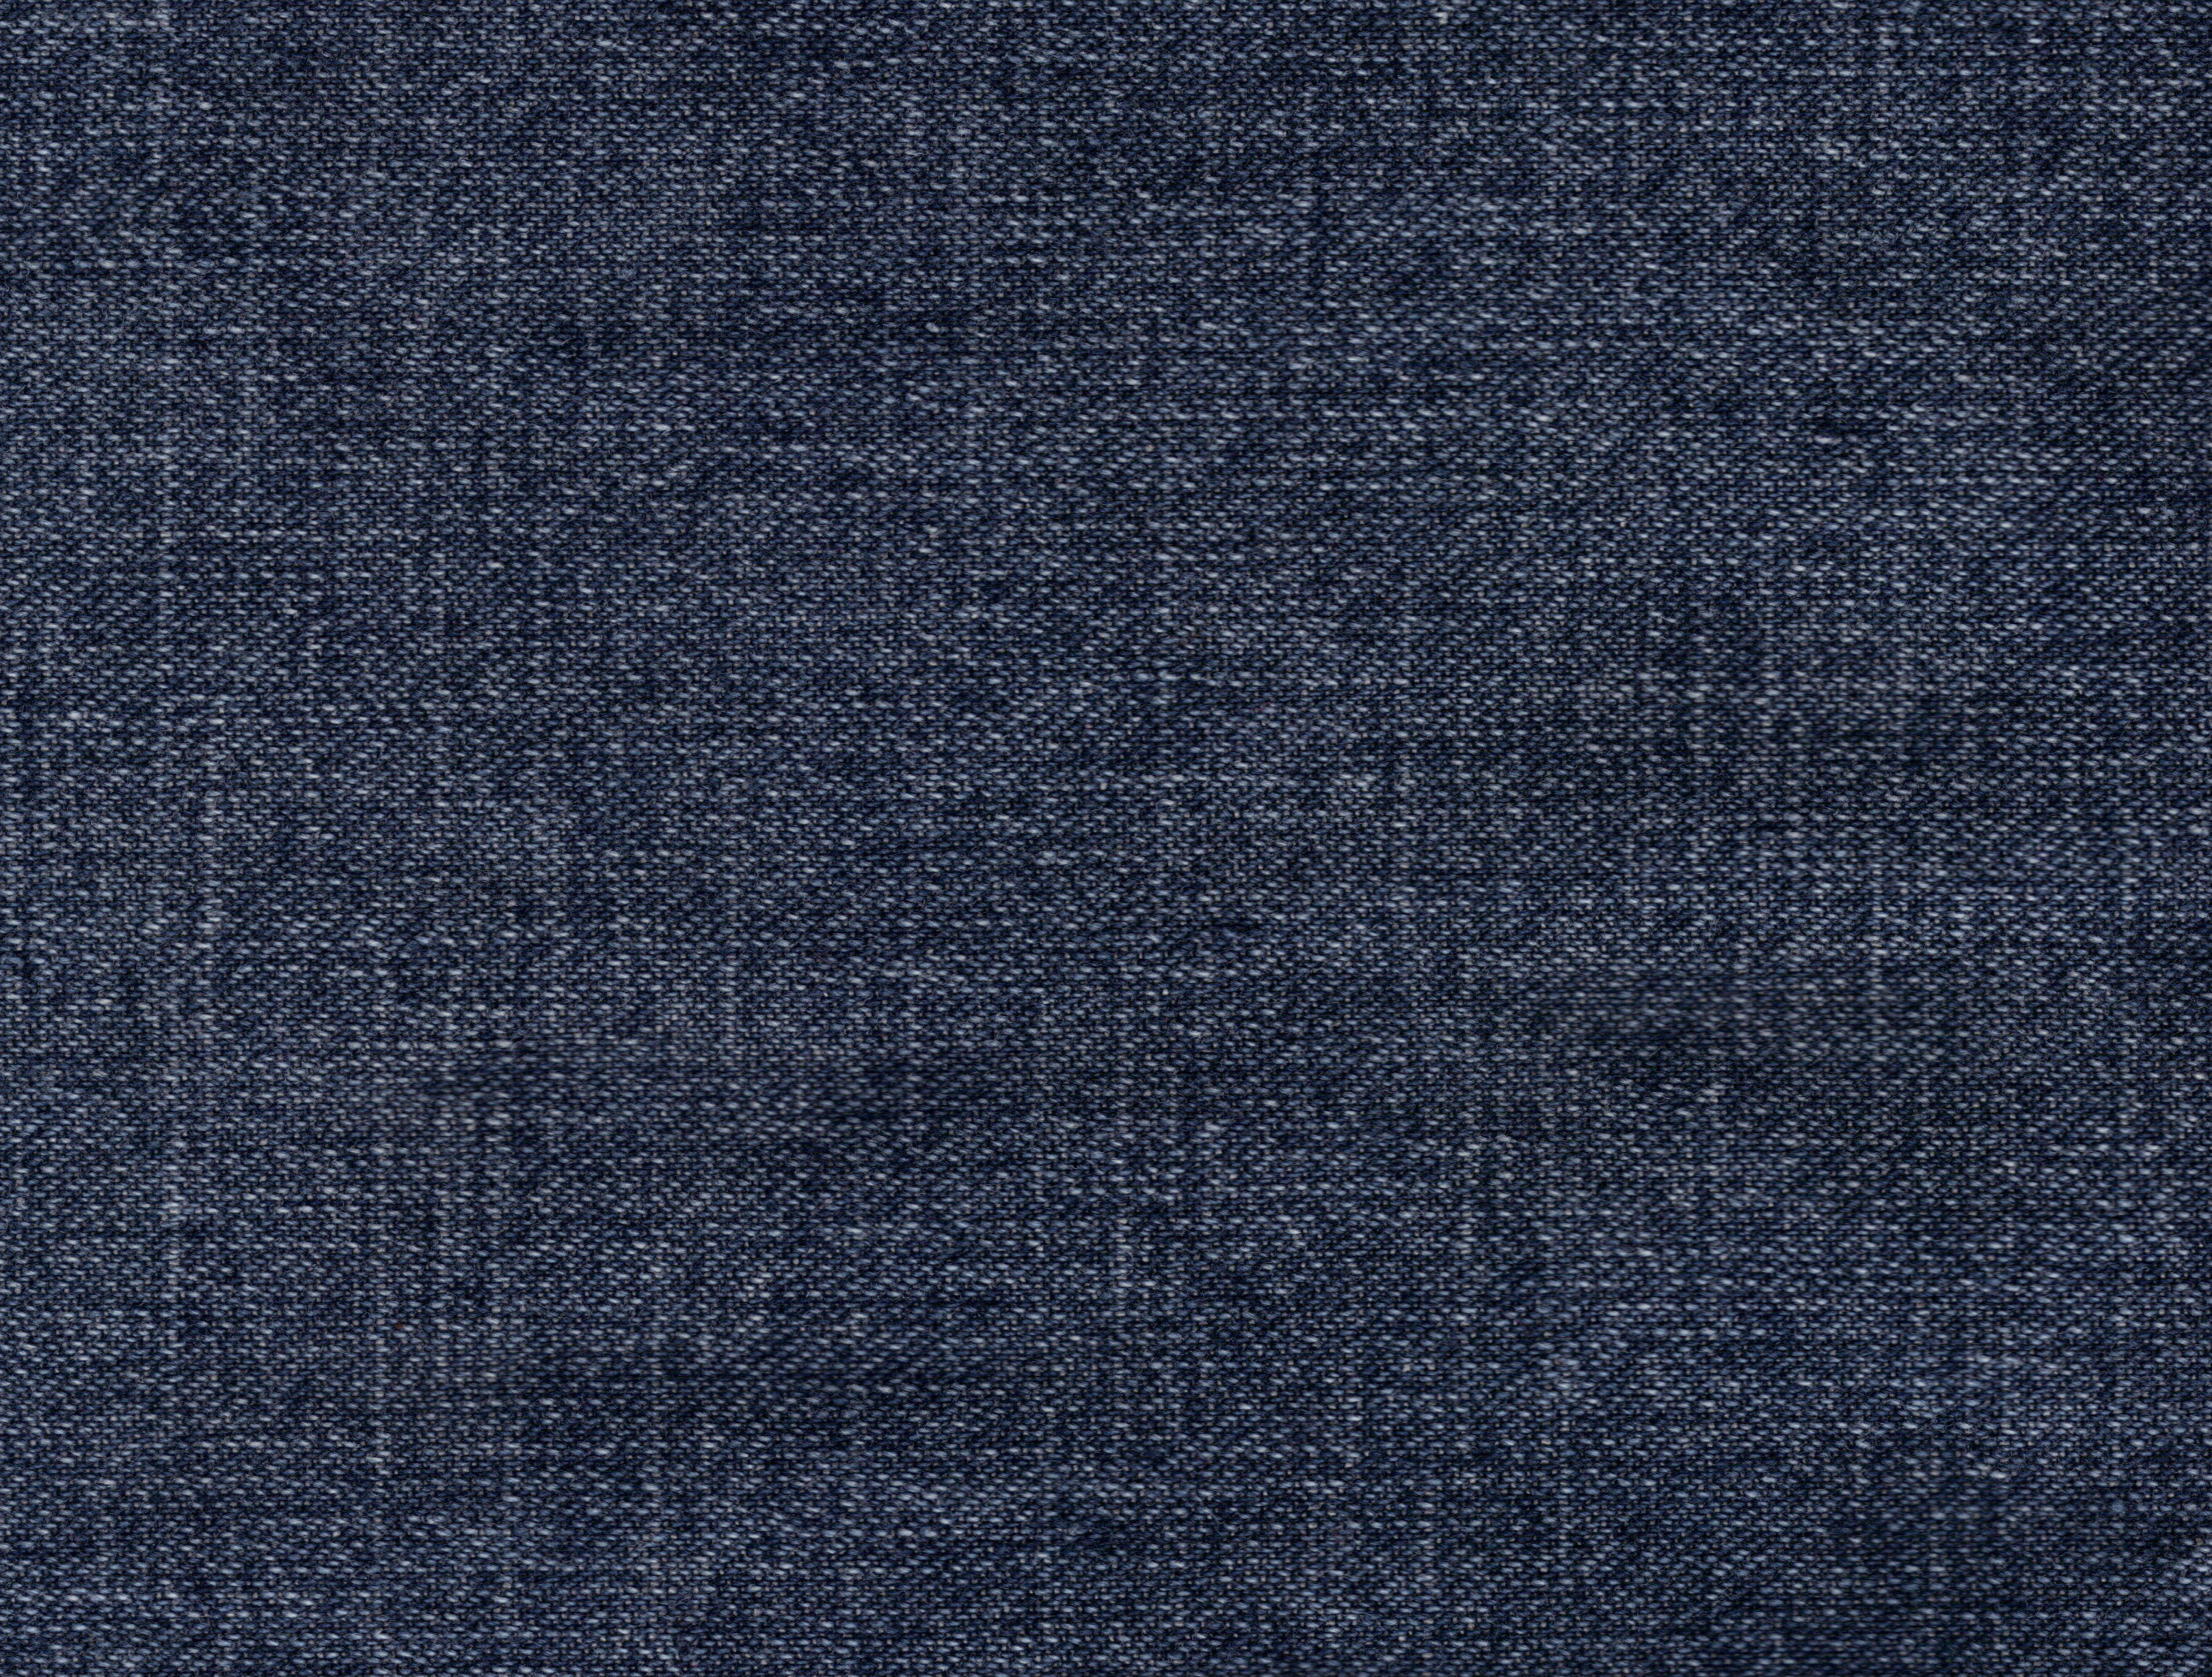 Denim Texture (JPG).